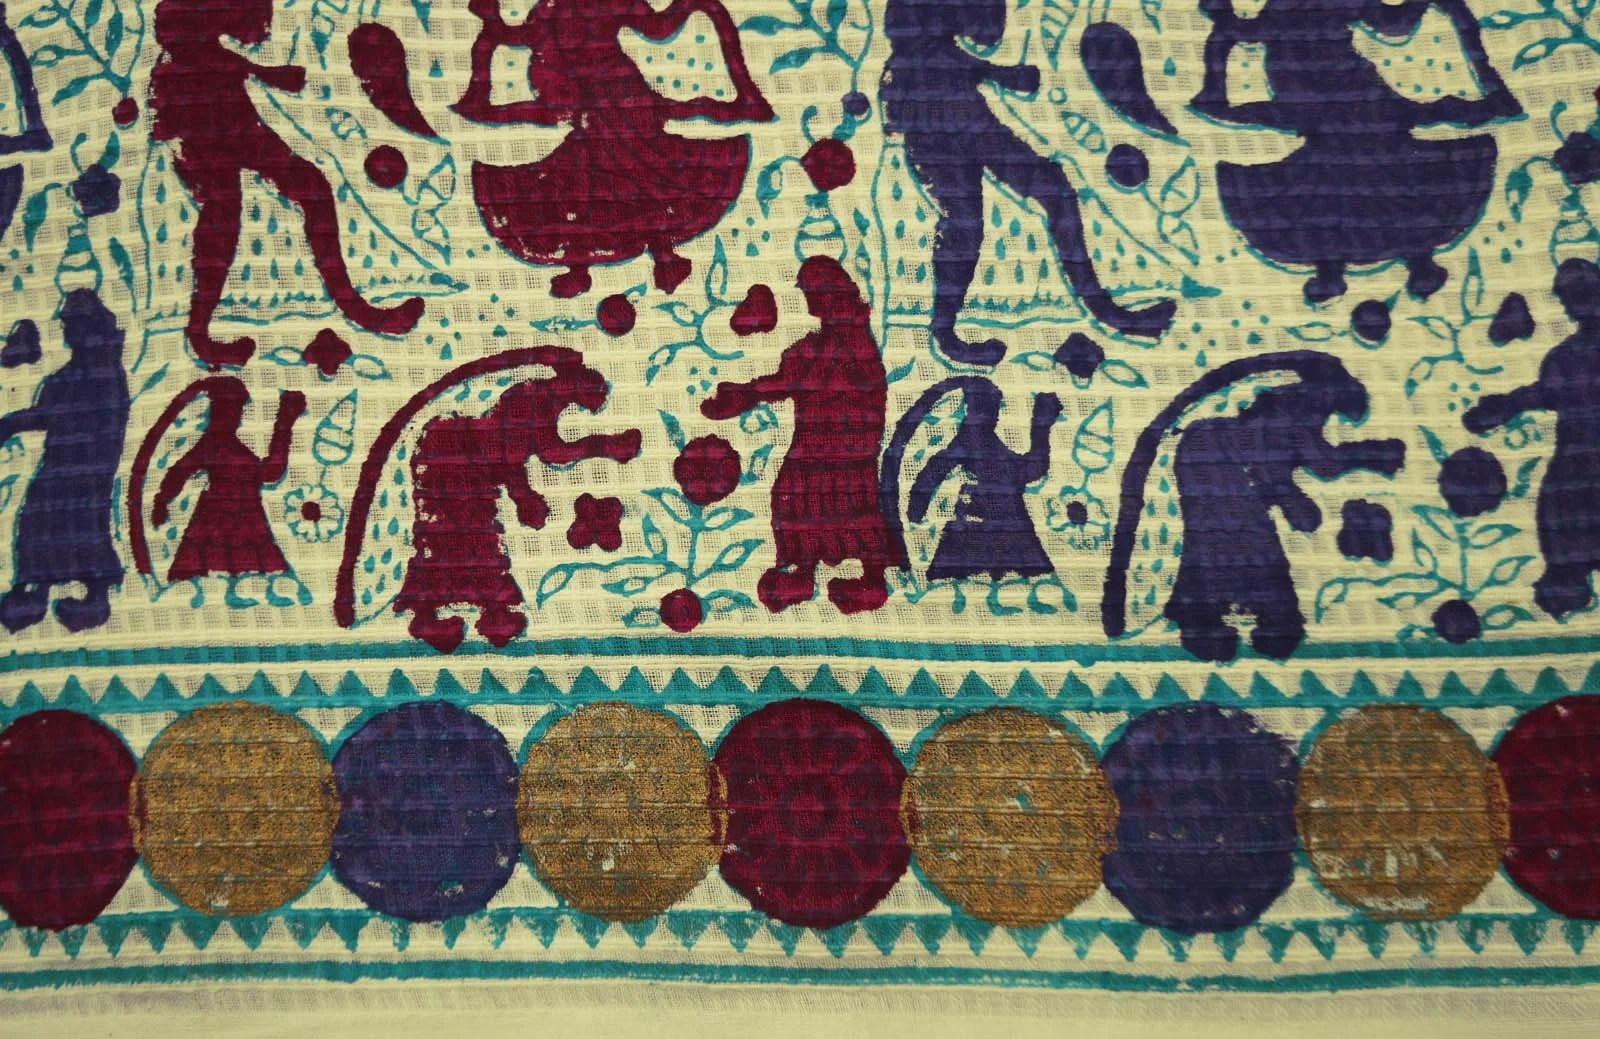 Home Decor Fabric Tribal Print Beige Fabric Quilt Fabric